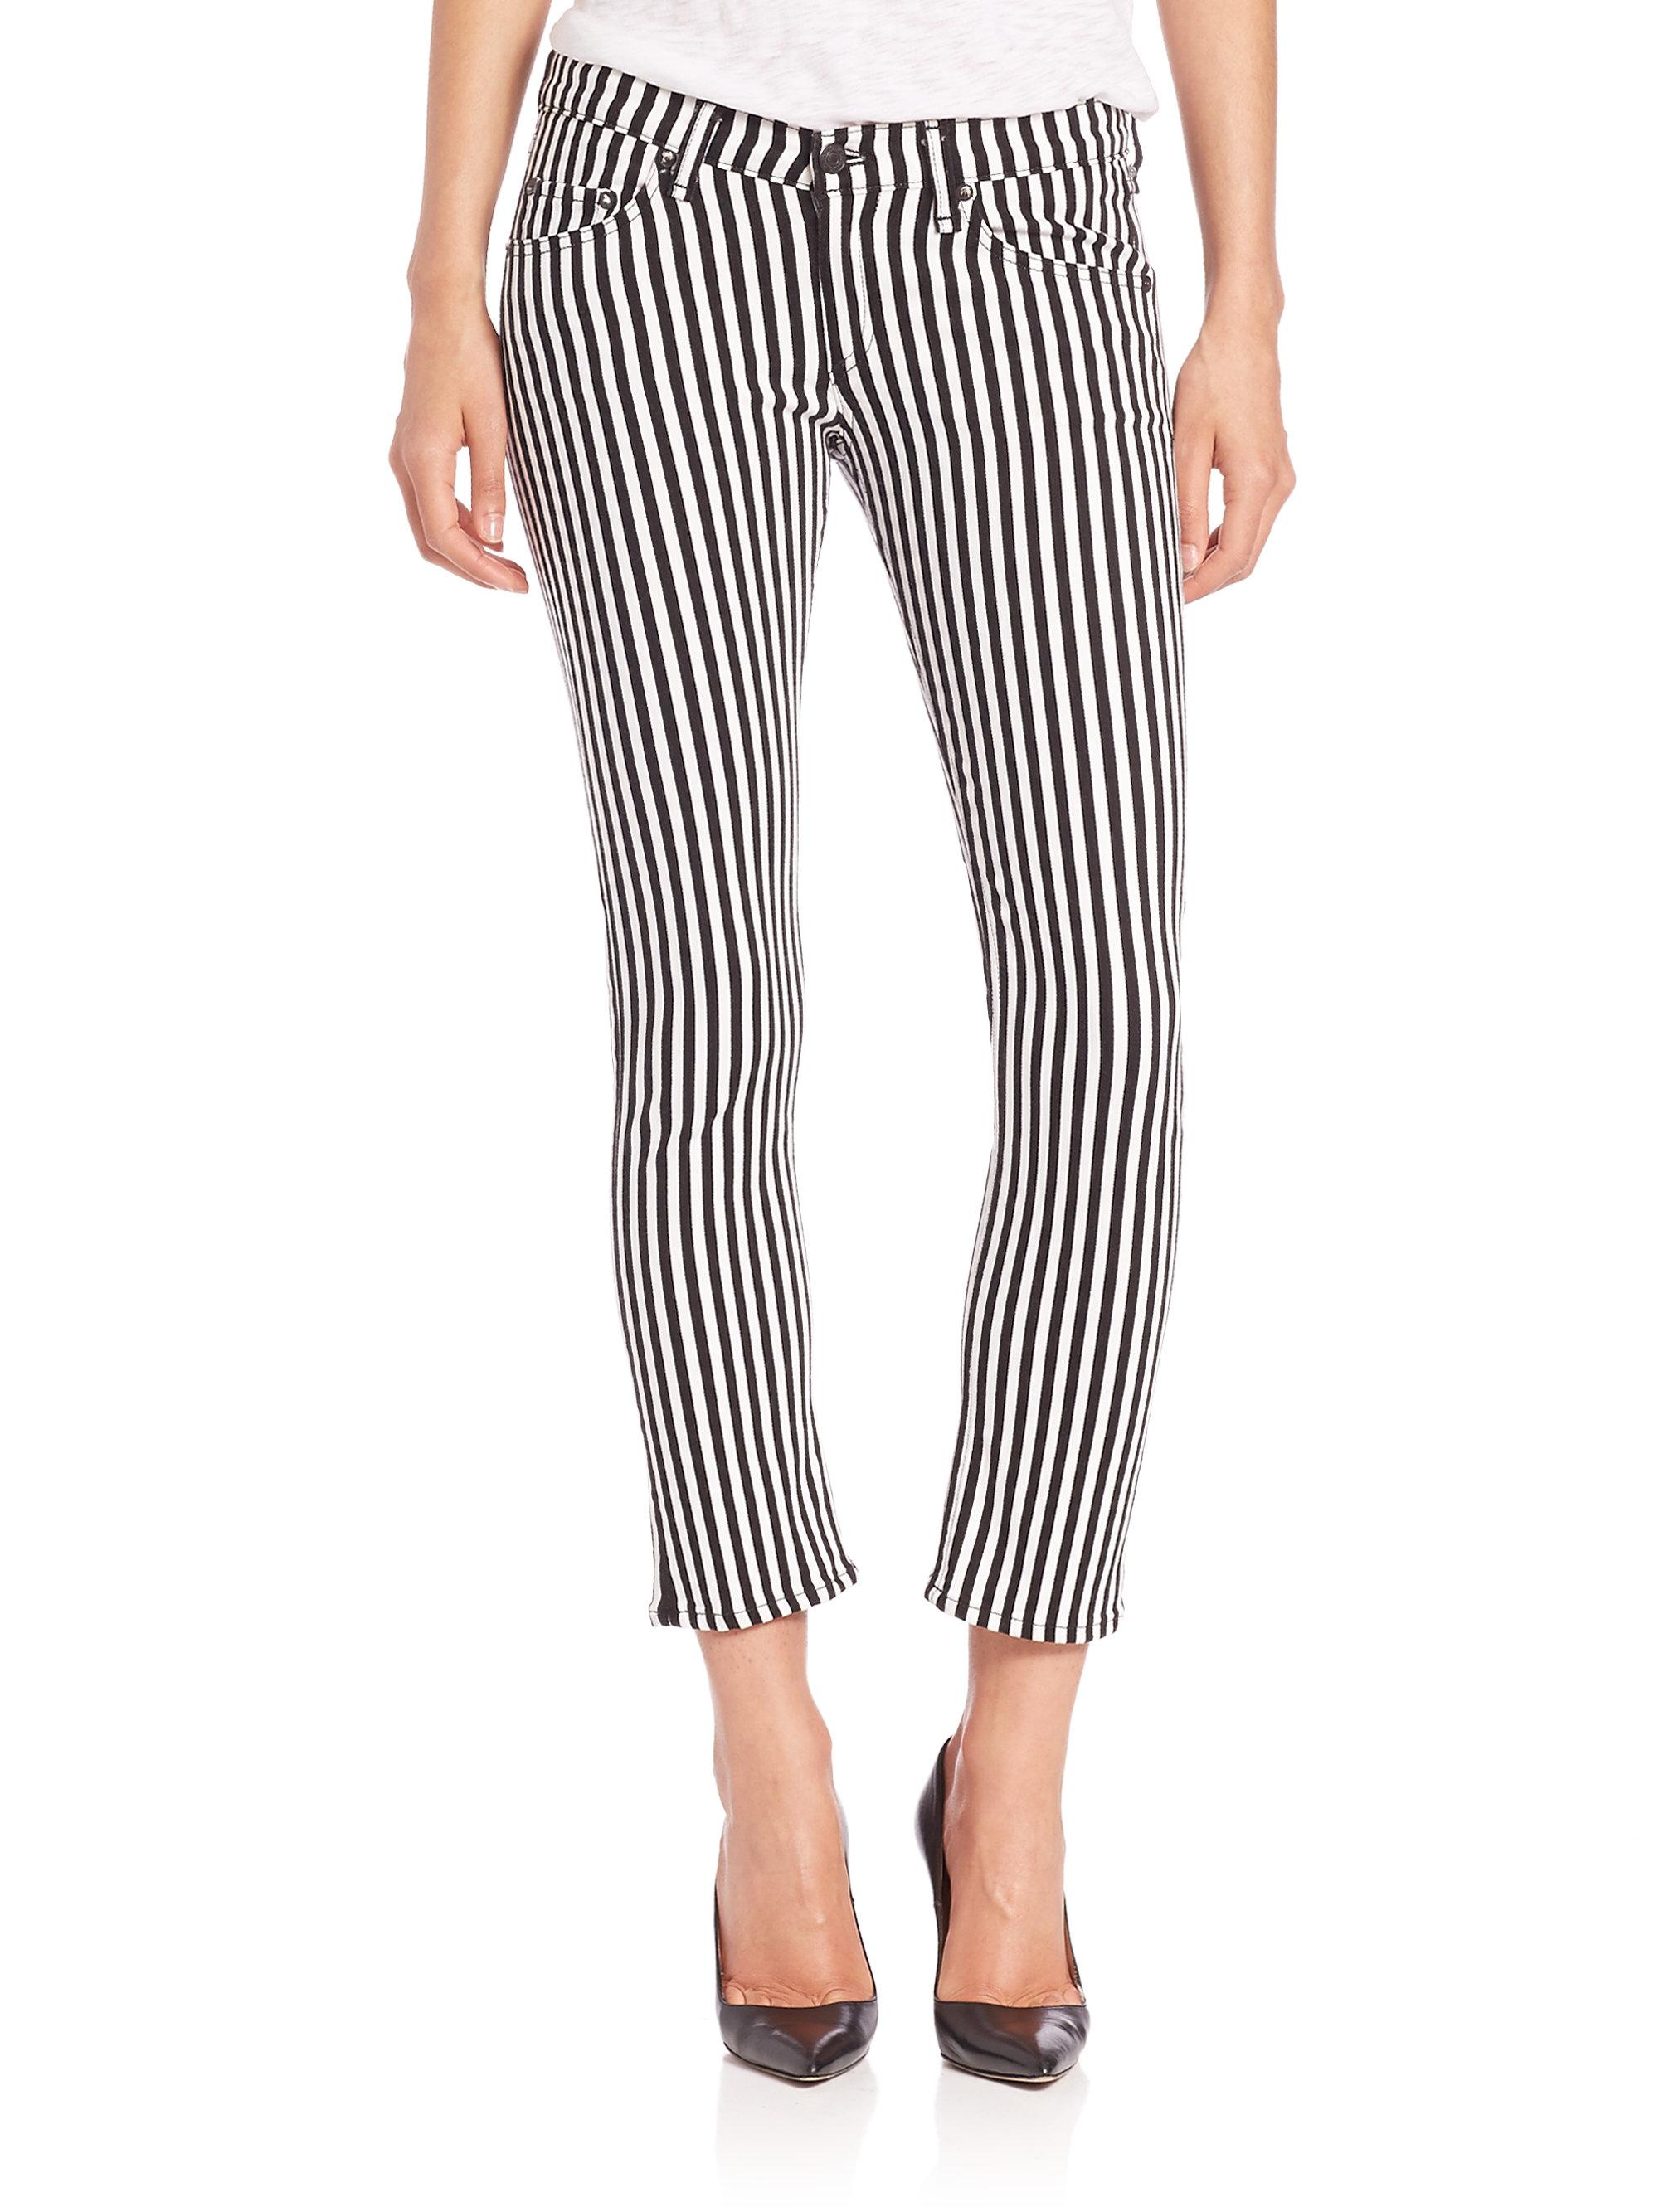 Rag & Bone Striped Mid-Rise Jeans Sale High Quality Get Authentic iBtbN